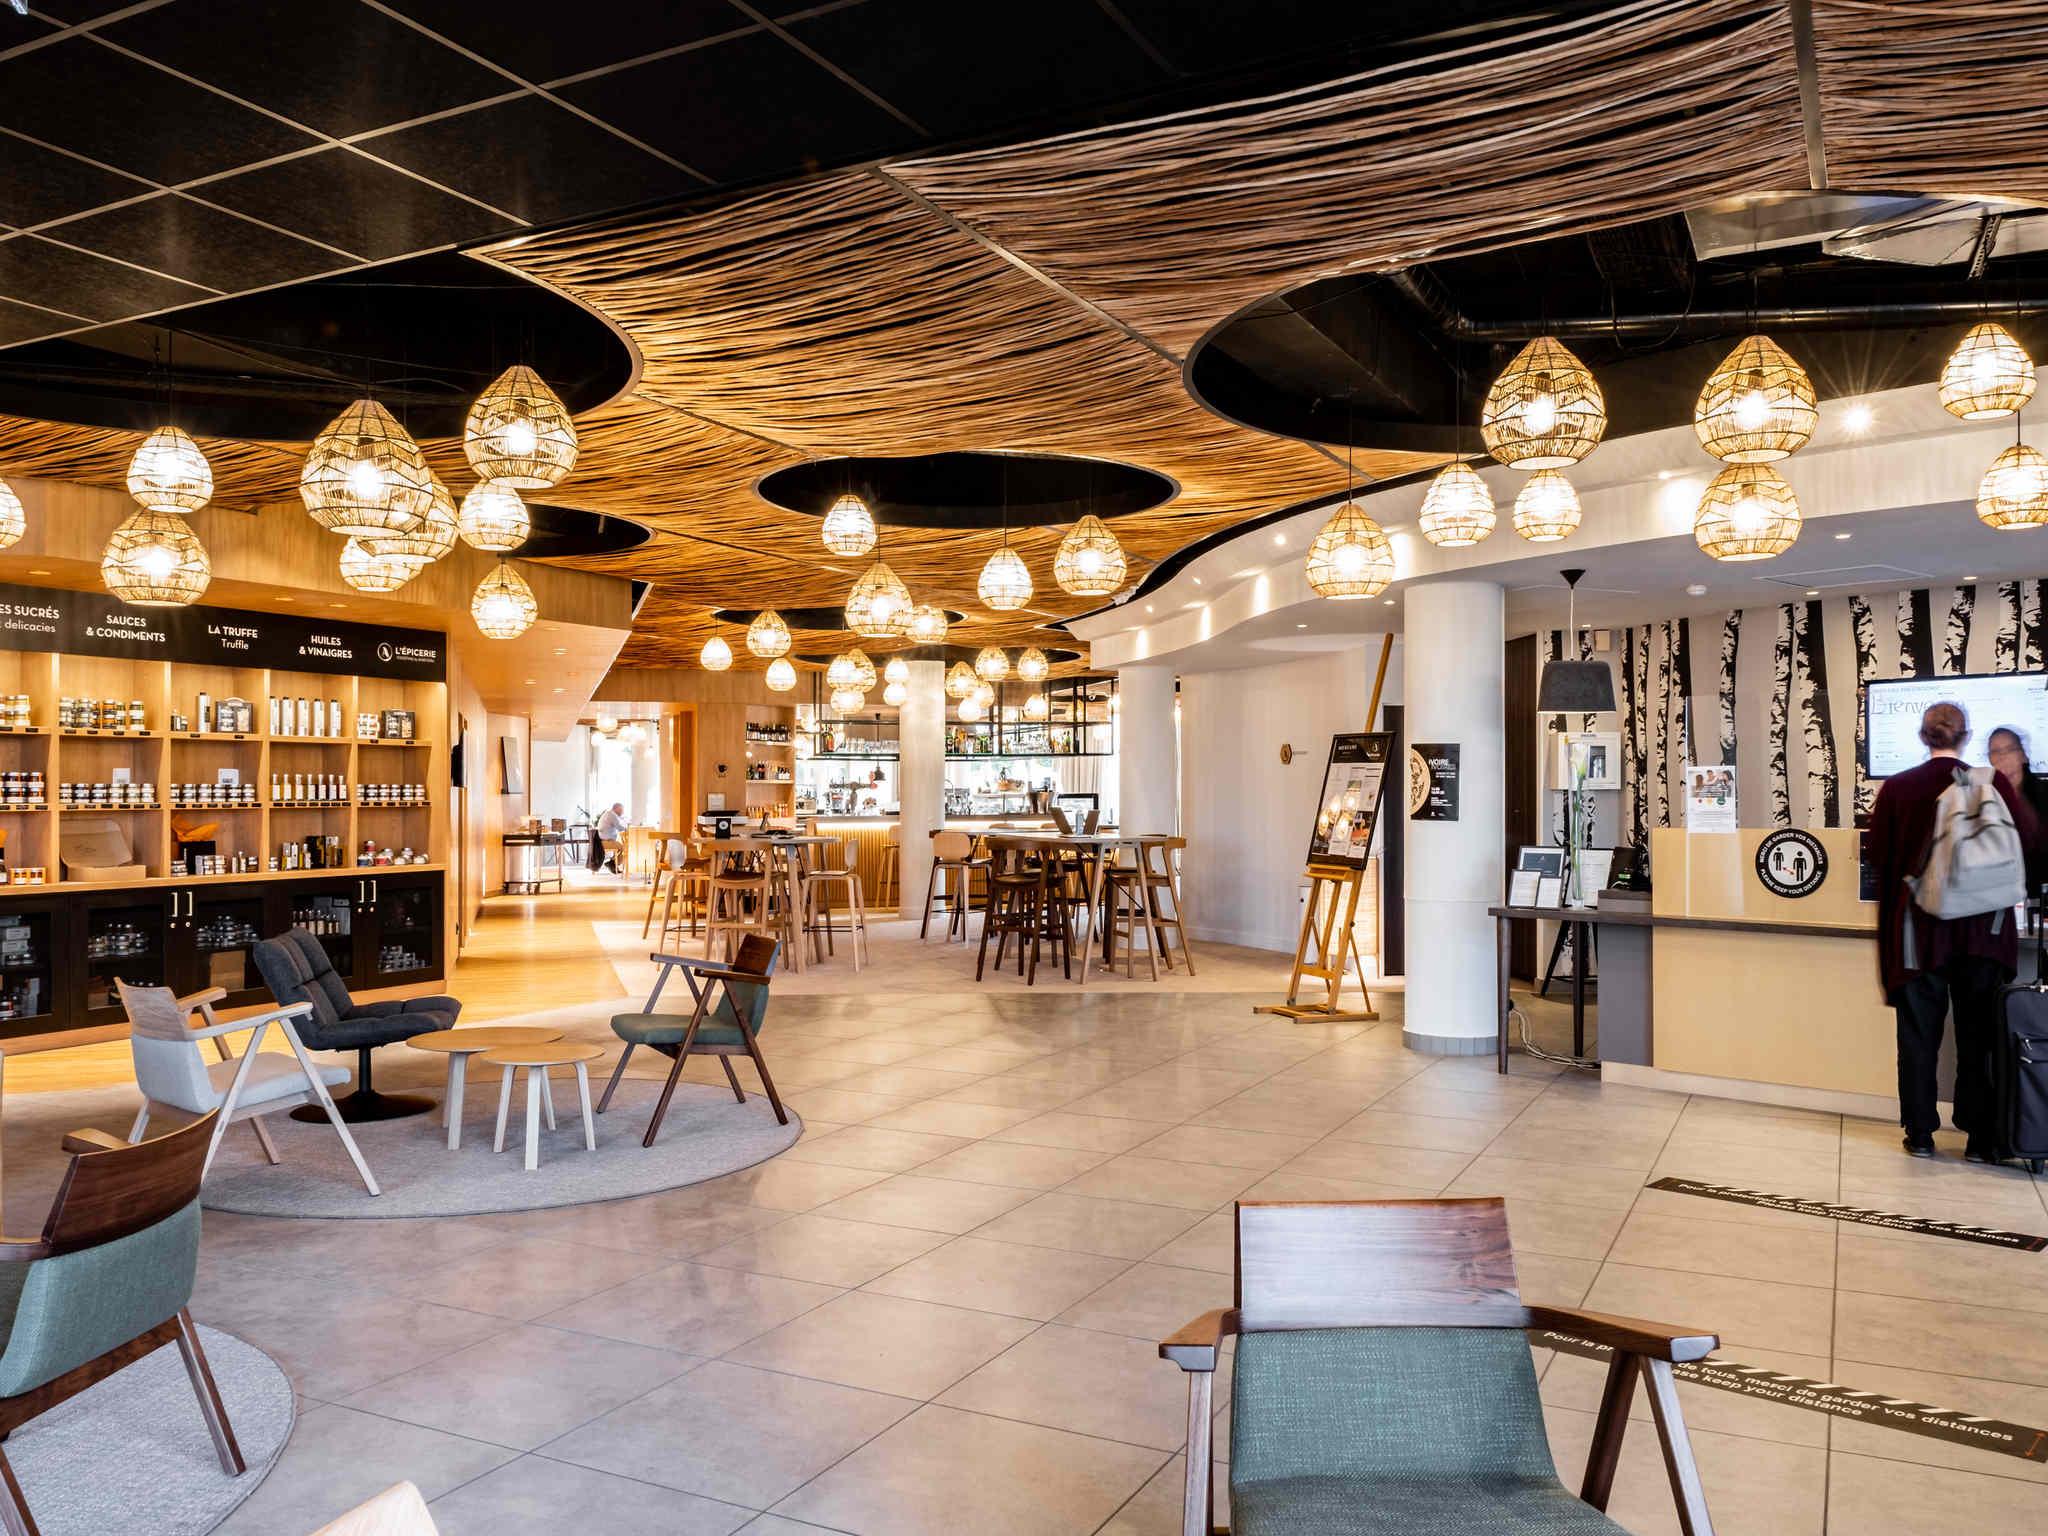 hotel in lacroix saint ouen mercure compi gne sud hotel. Black Bedroom Furniture Sets. Home Design Ideas